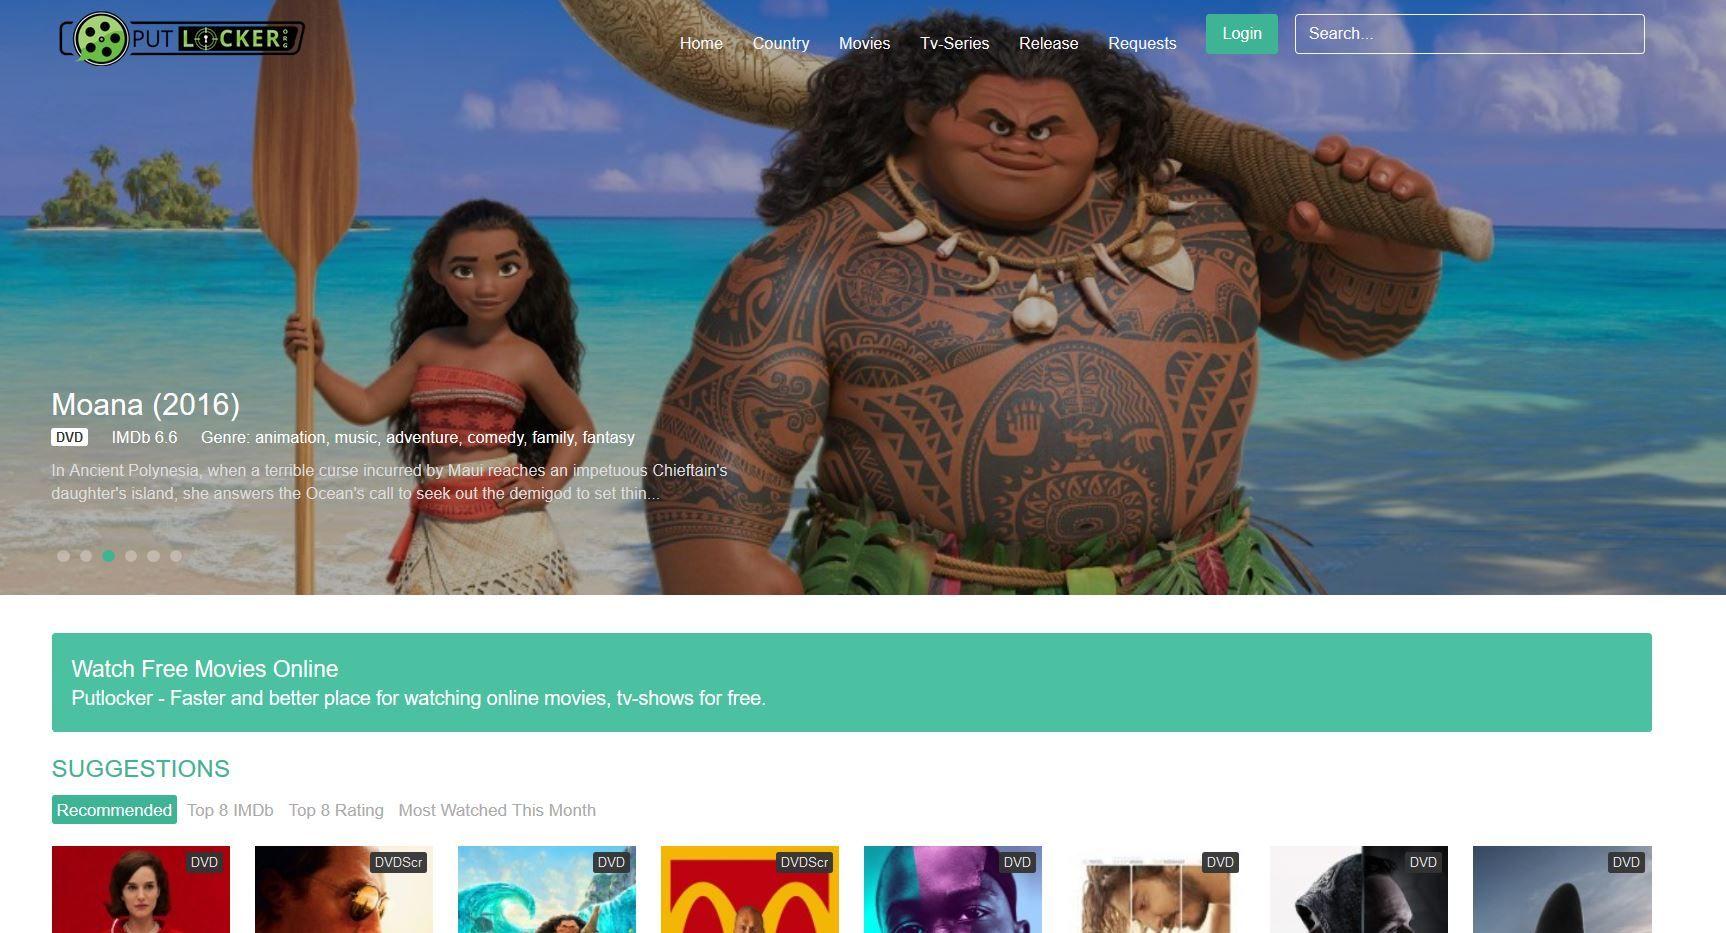 Fmovies - Fmovies Watch Movies Online Putlocker Fmovies 123movies